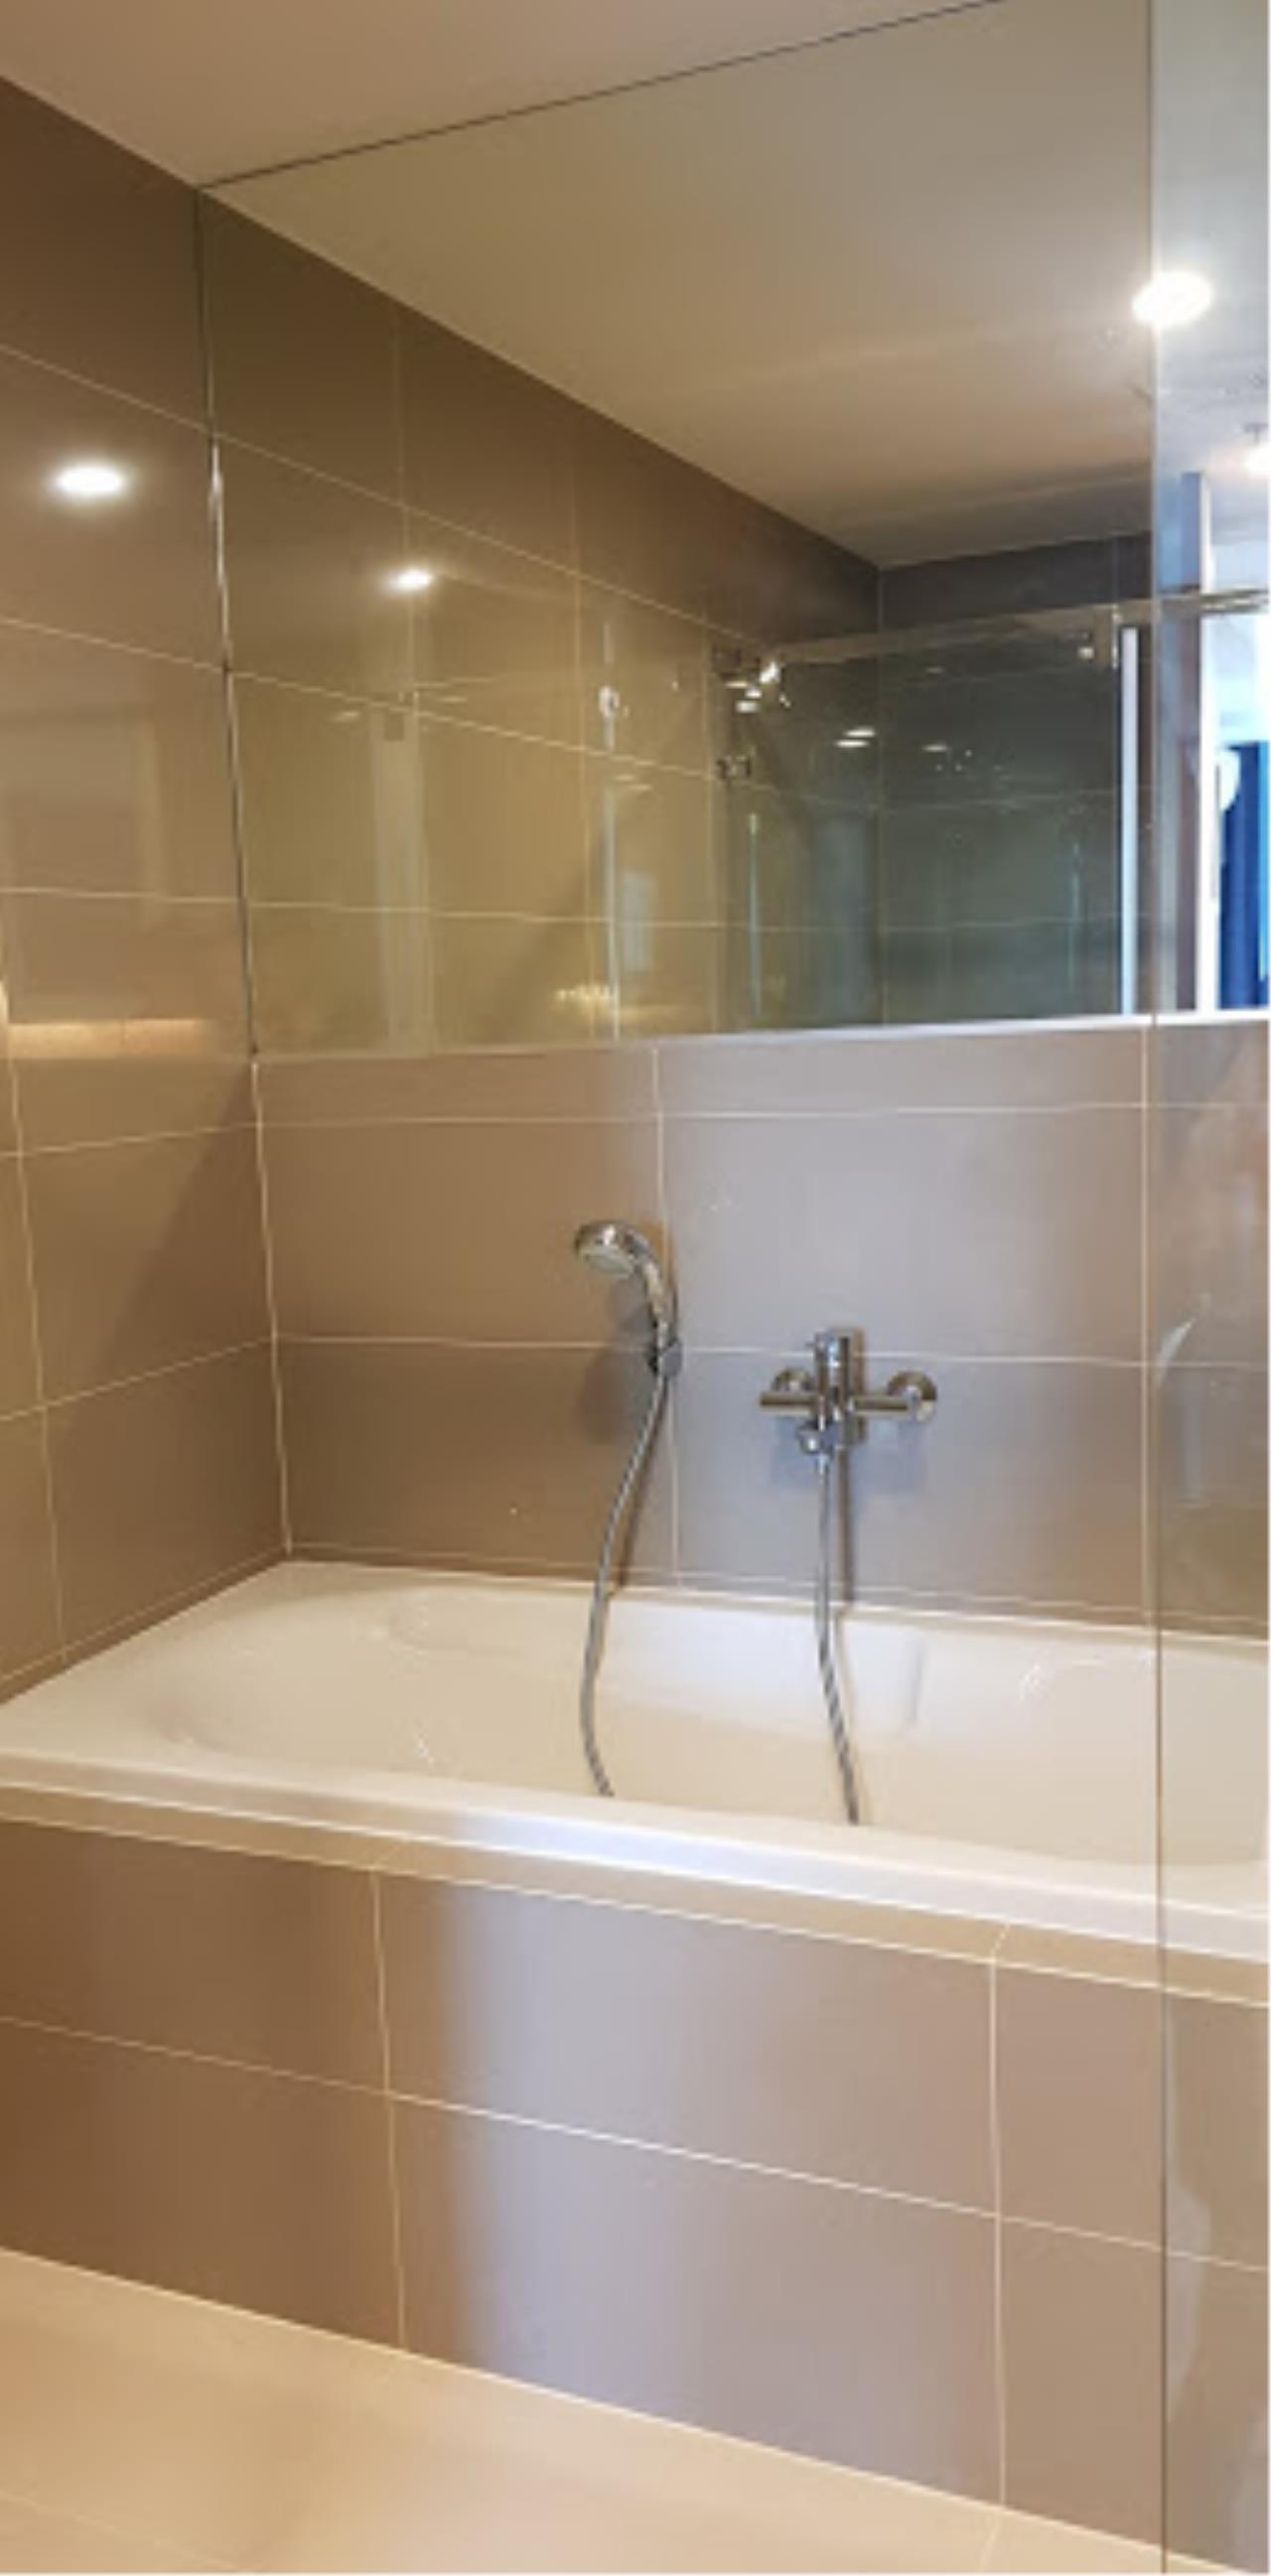 Quality Life Property Agency's S A L E & R E N T ! 15 Sukhumvit Residence | 1 BED 1 BATH | 59.29 SQ. M. 1